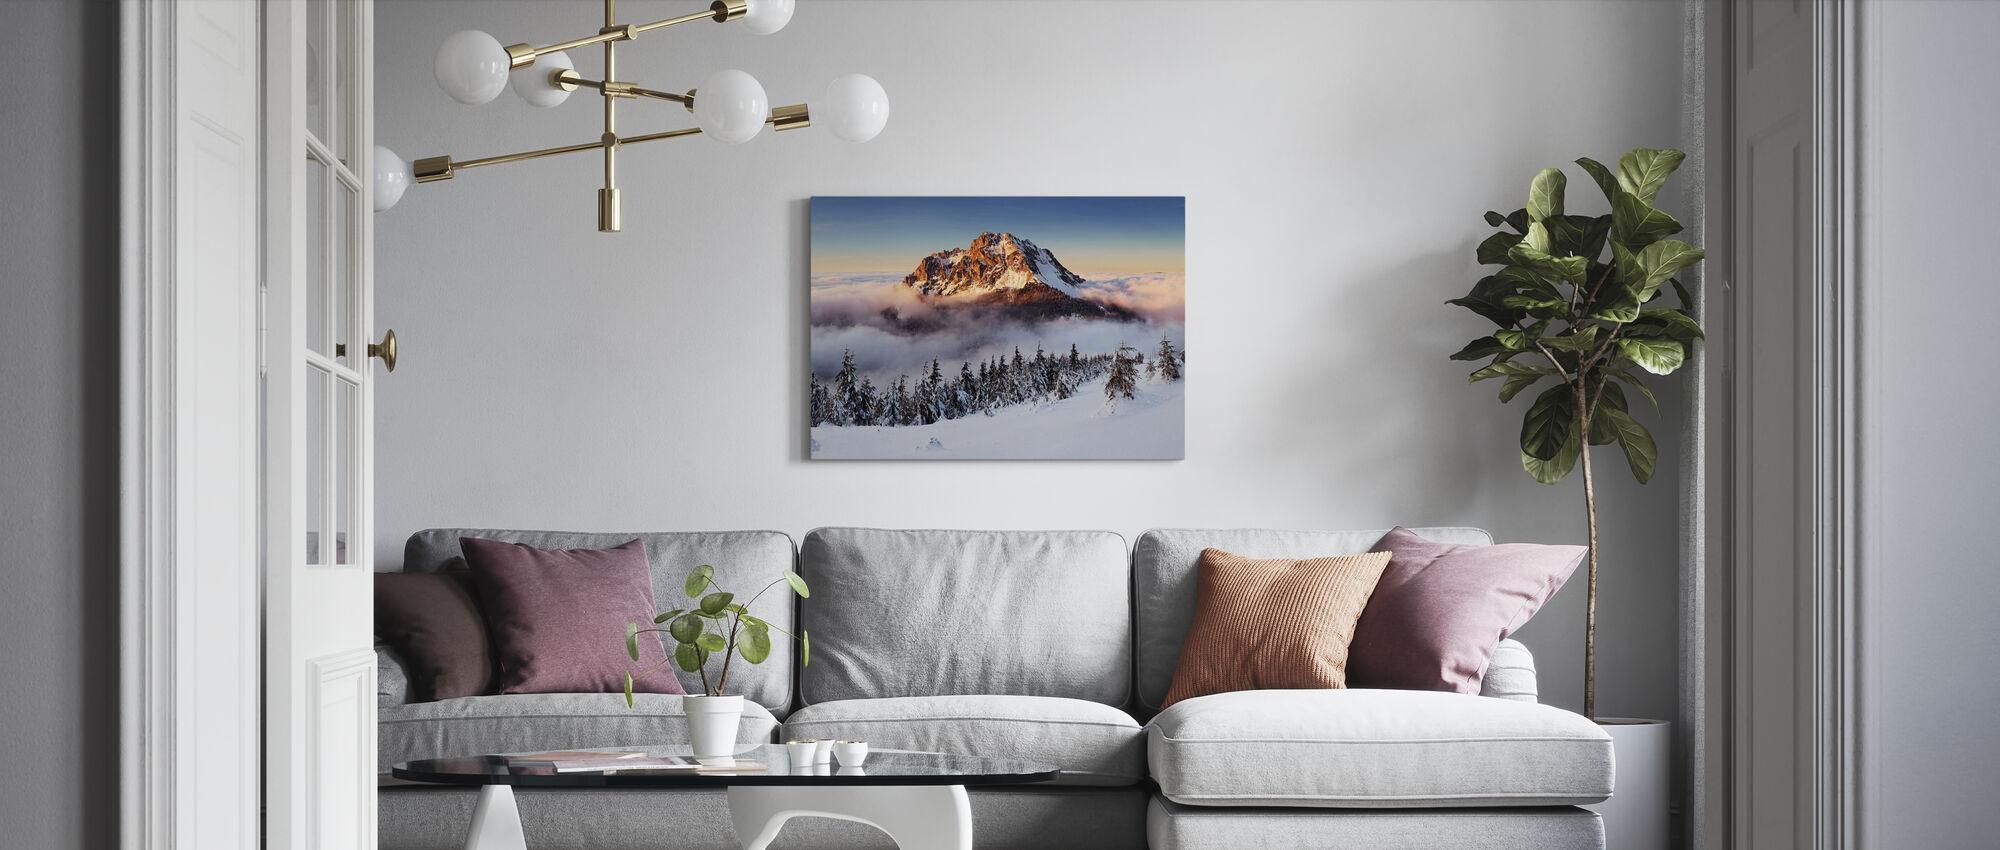 Snowy Mountain - Canvas print - Living Room